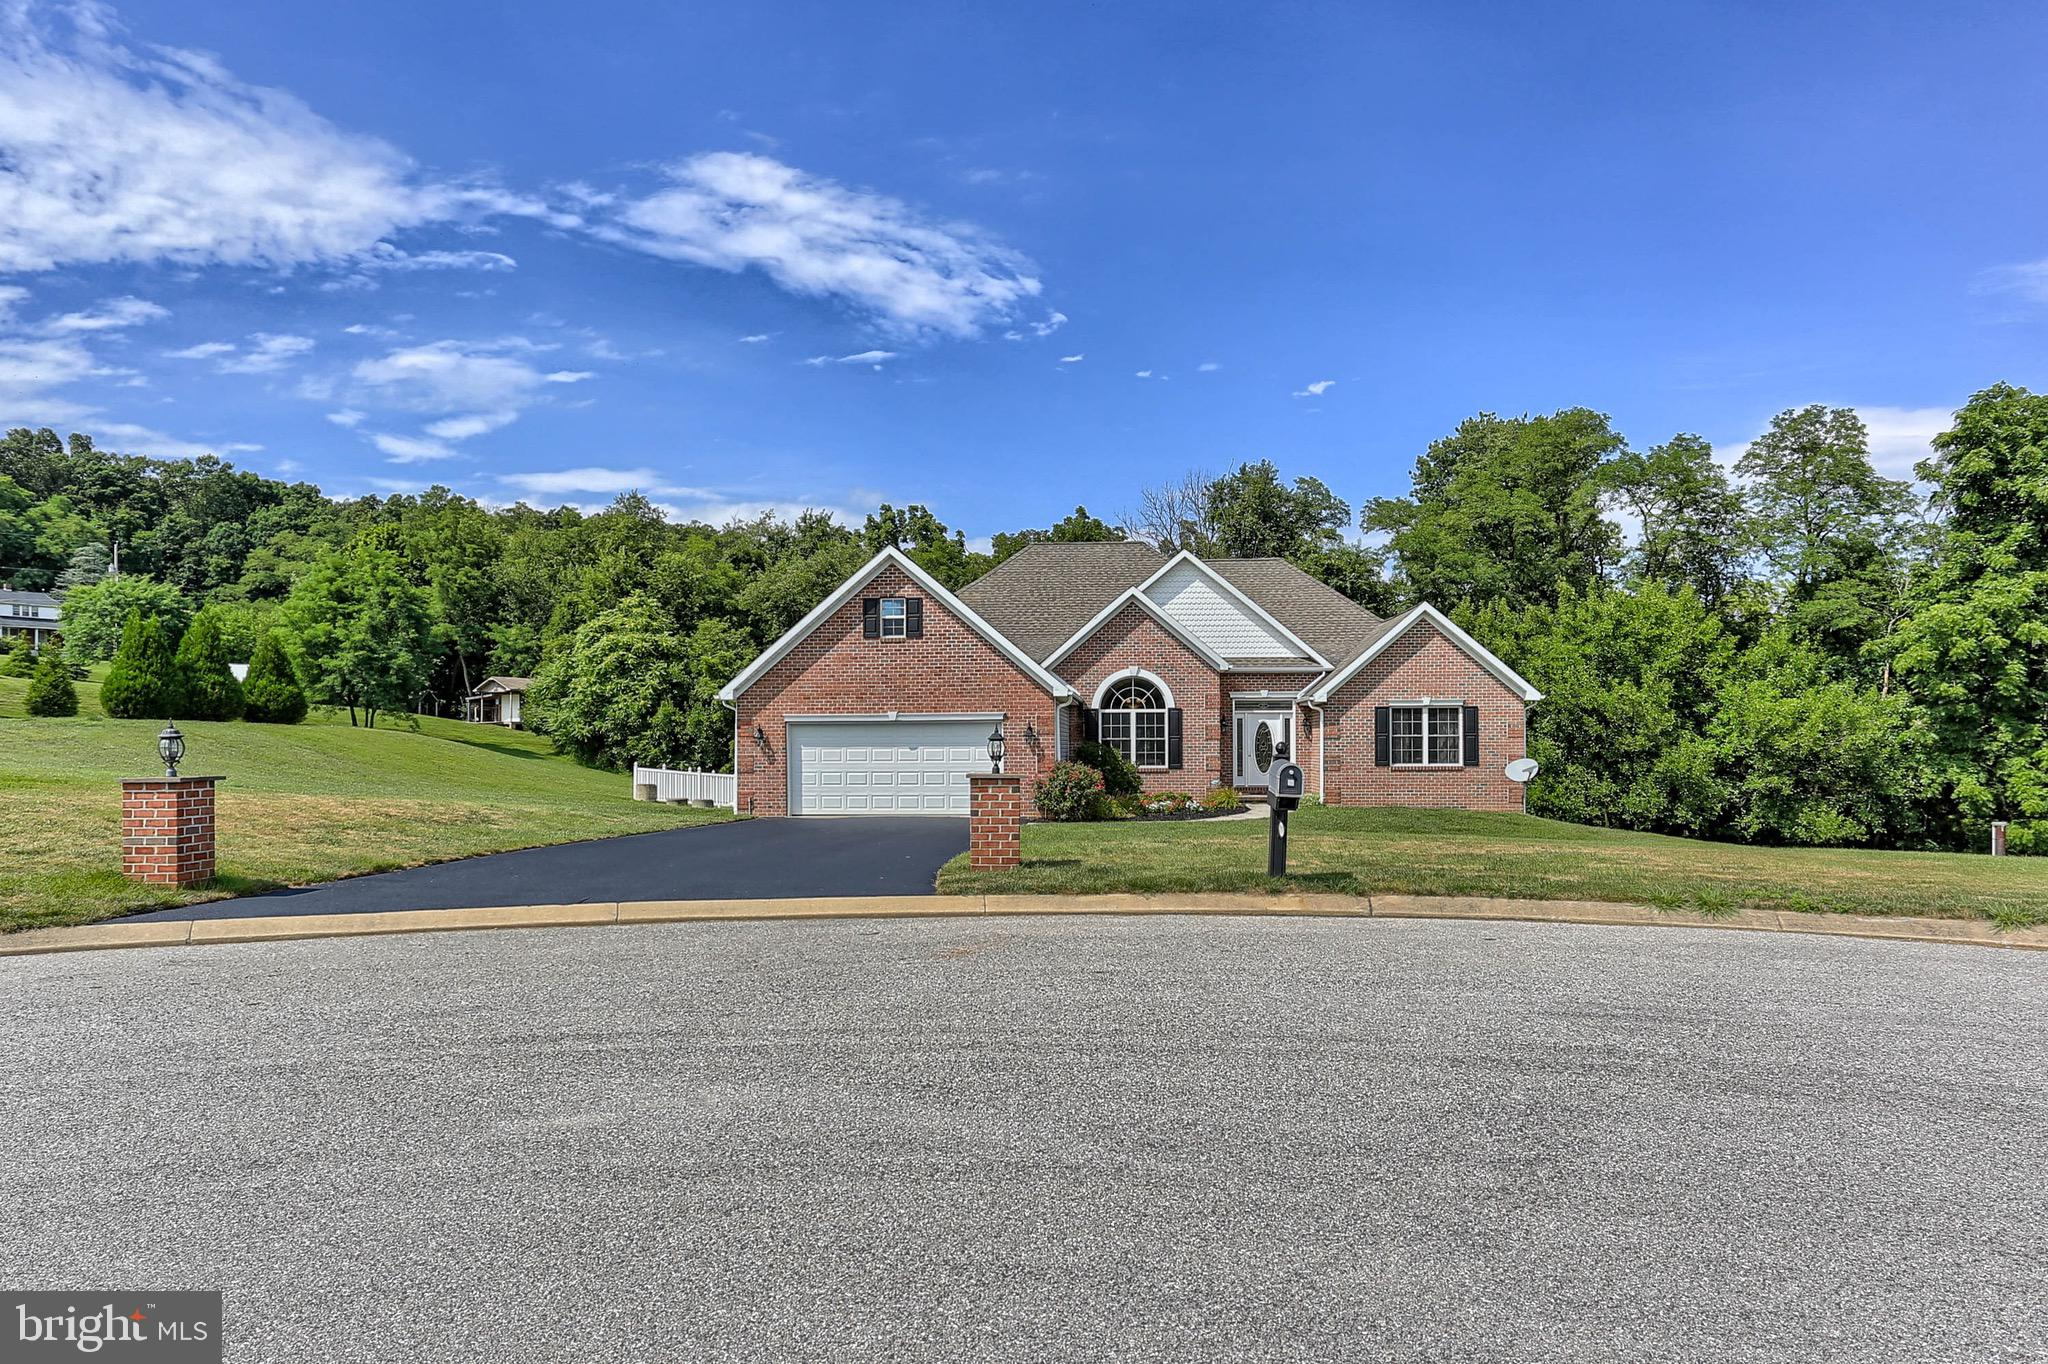 939 Amy Lane, Spring Grove, PA 17362